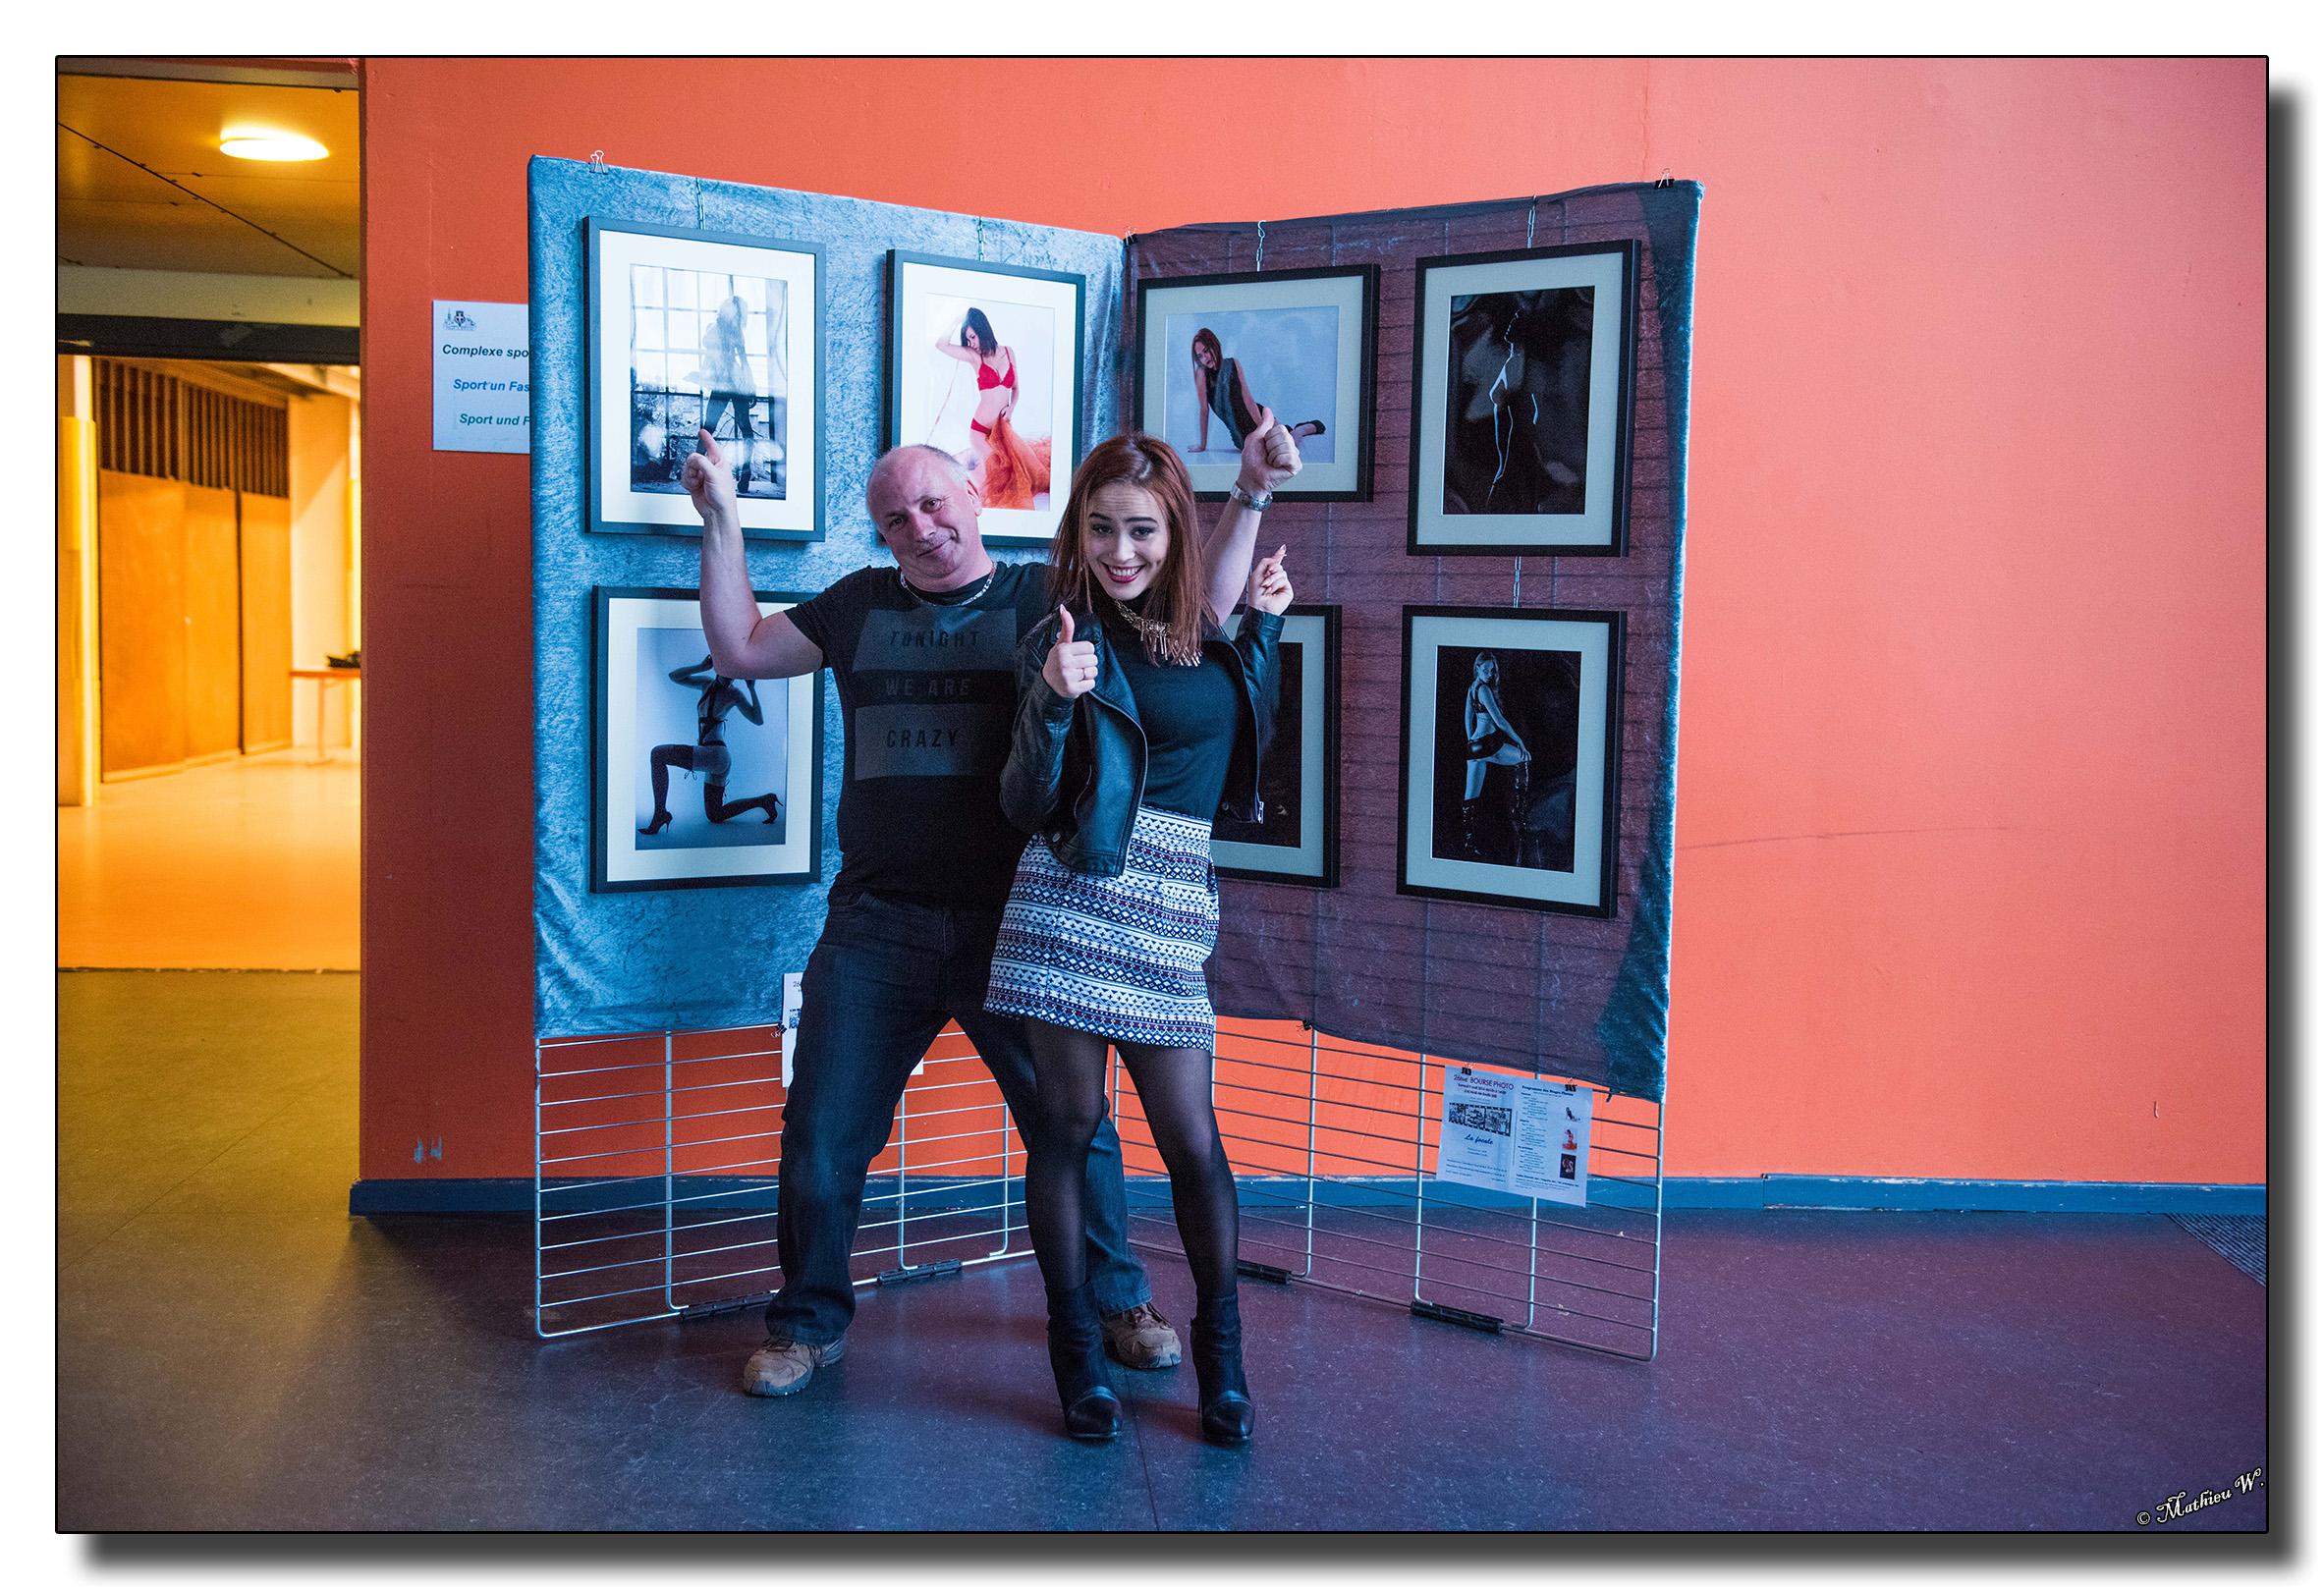 2016-04 Angela Di Blasi - Stages photos soultz (20)